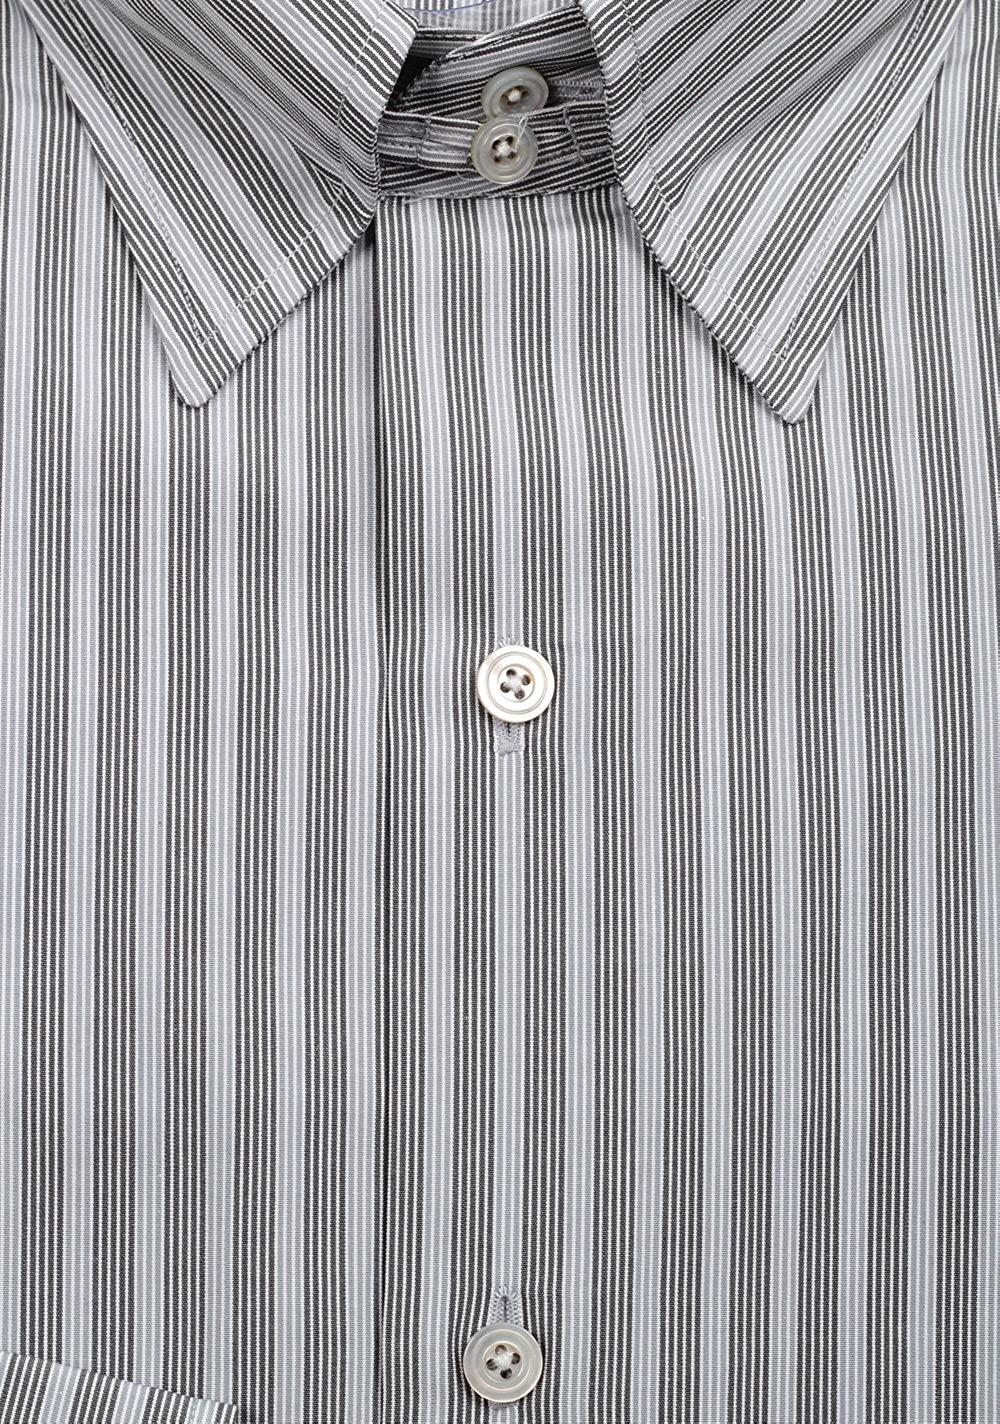 CL Tom Ford Striped Gray High Collar Dress Shirt Size 40//15,75 U.S.